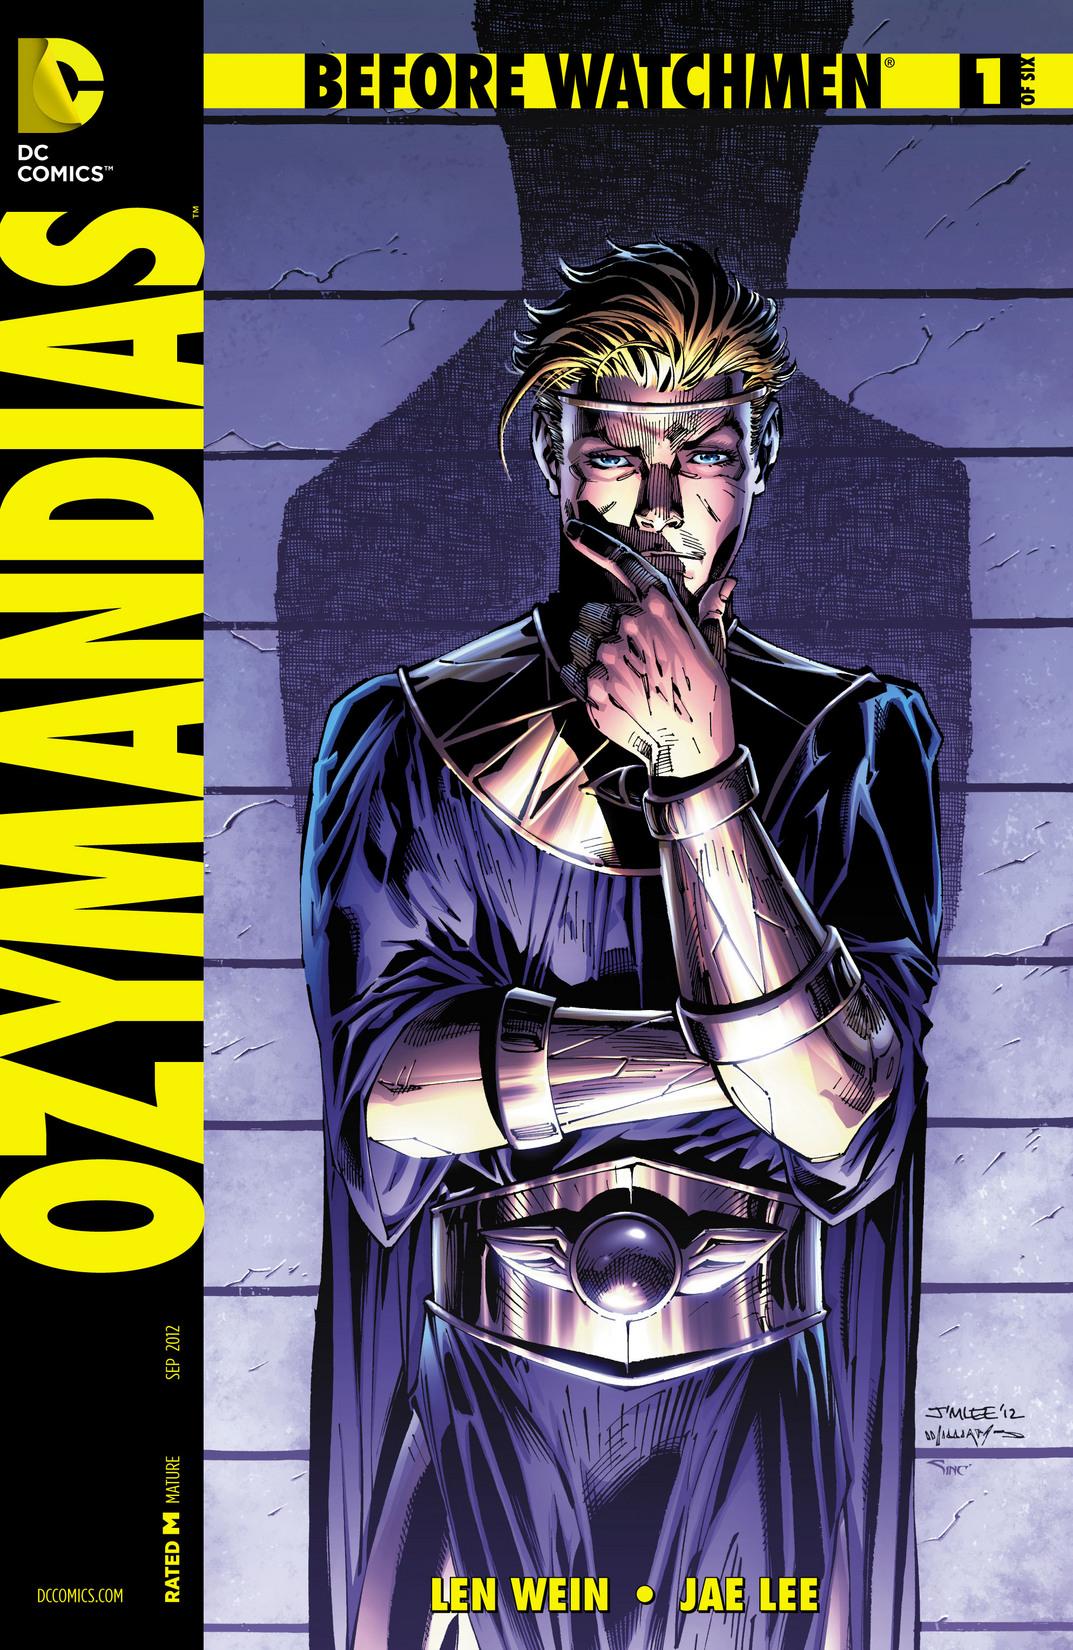 Image Before Watchmen Ozymandias Vol 1 1 Variant B Jpg